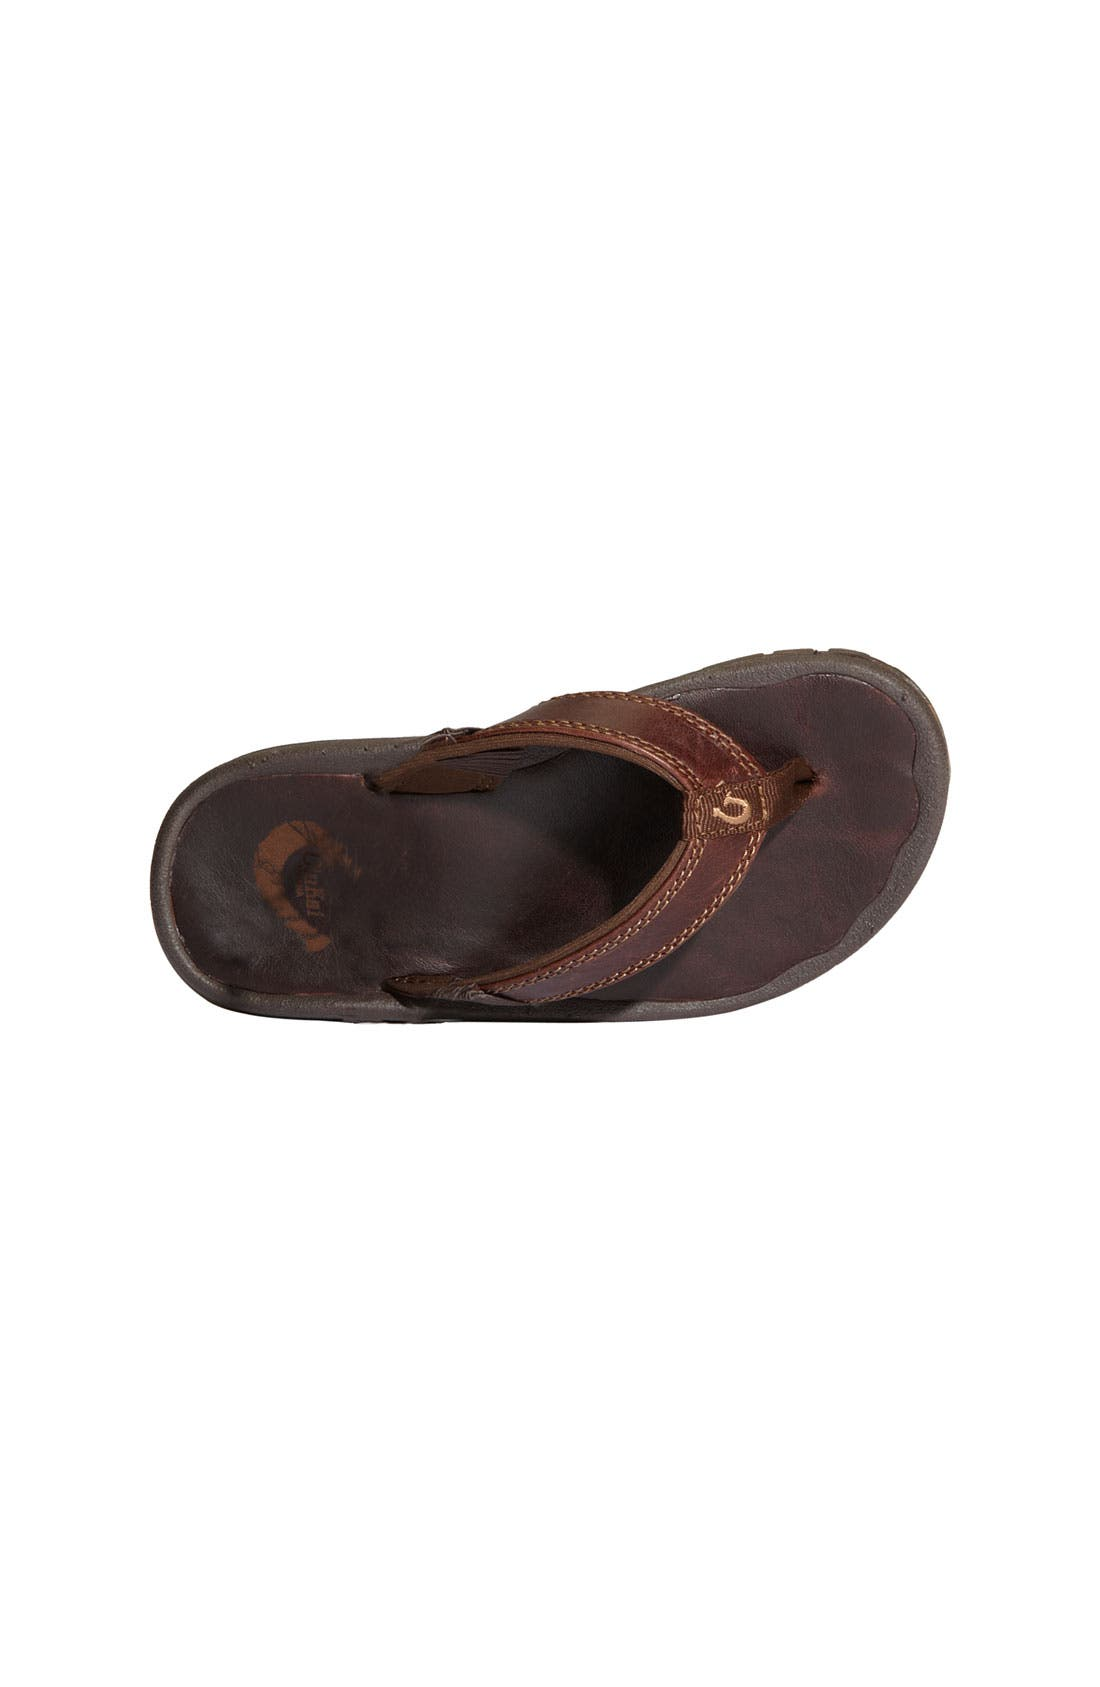 Alternate Image 3  - OluKai 'Ohana' Leather Sandal (Toddler, Little Kid & Big Kid)